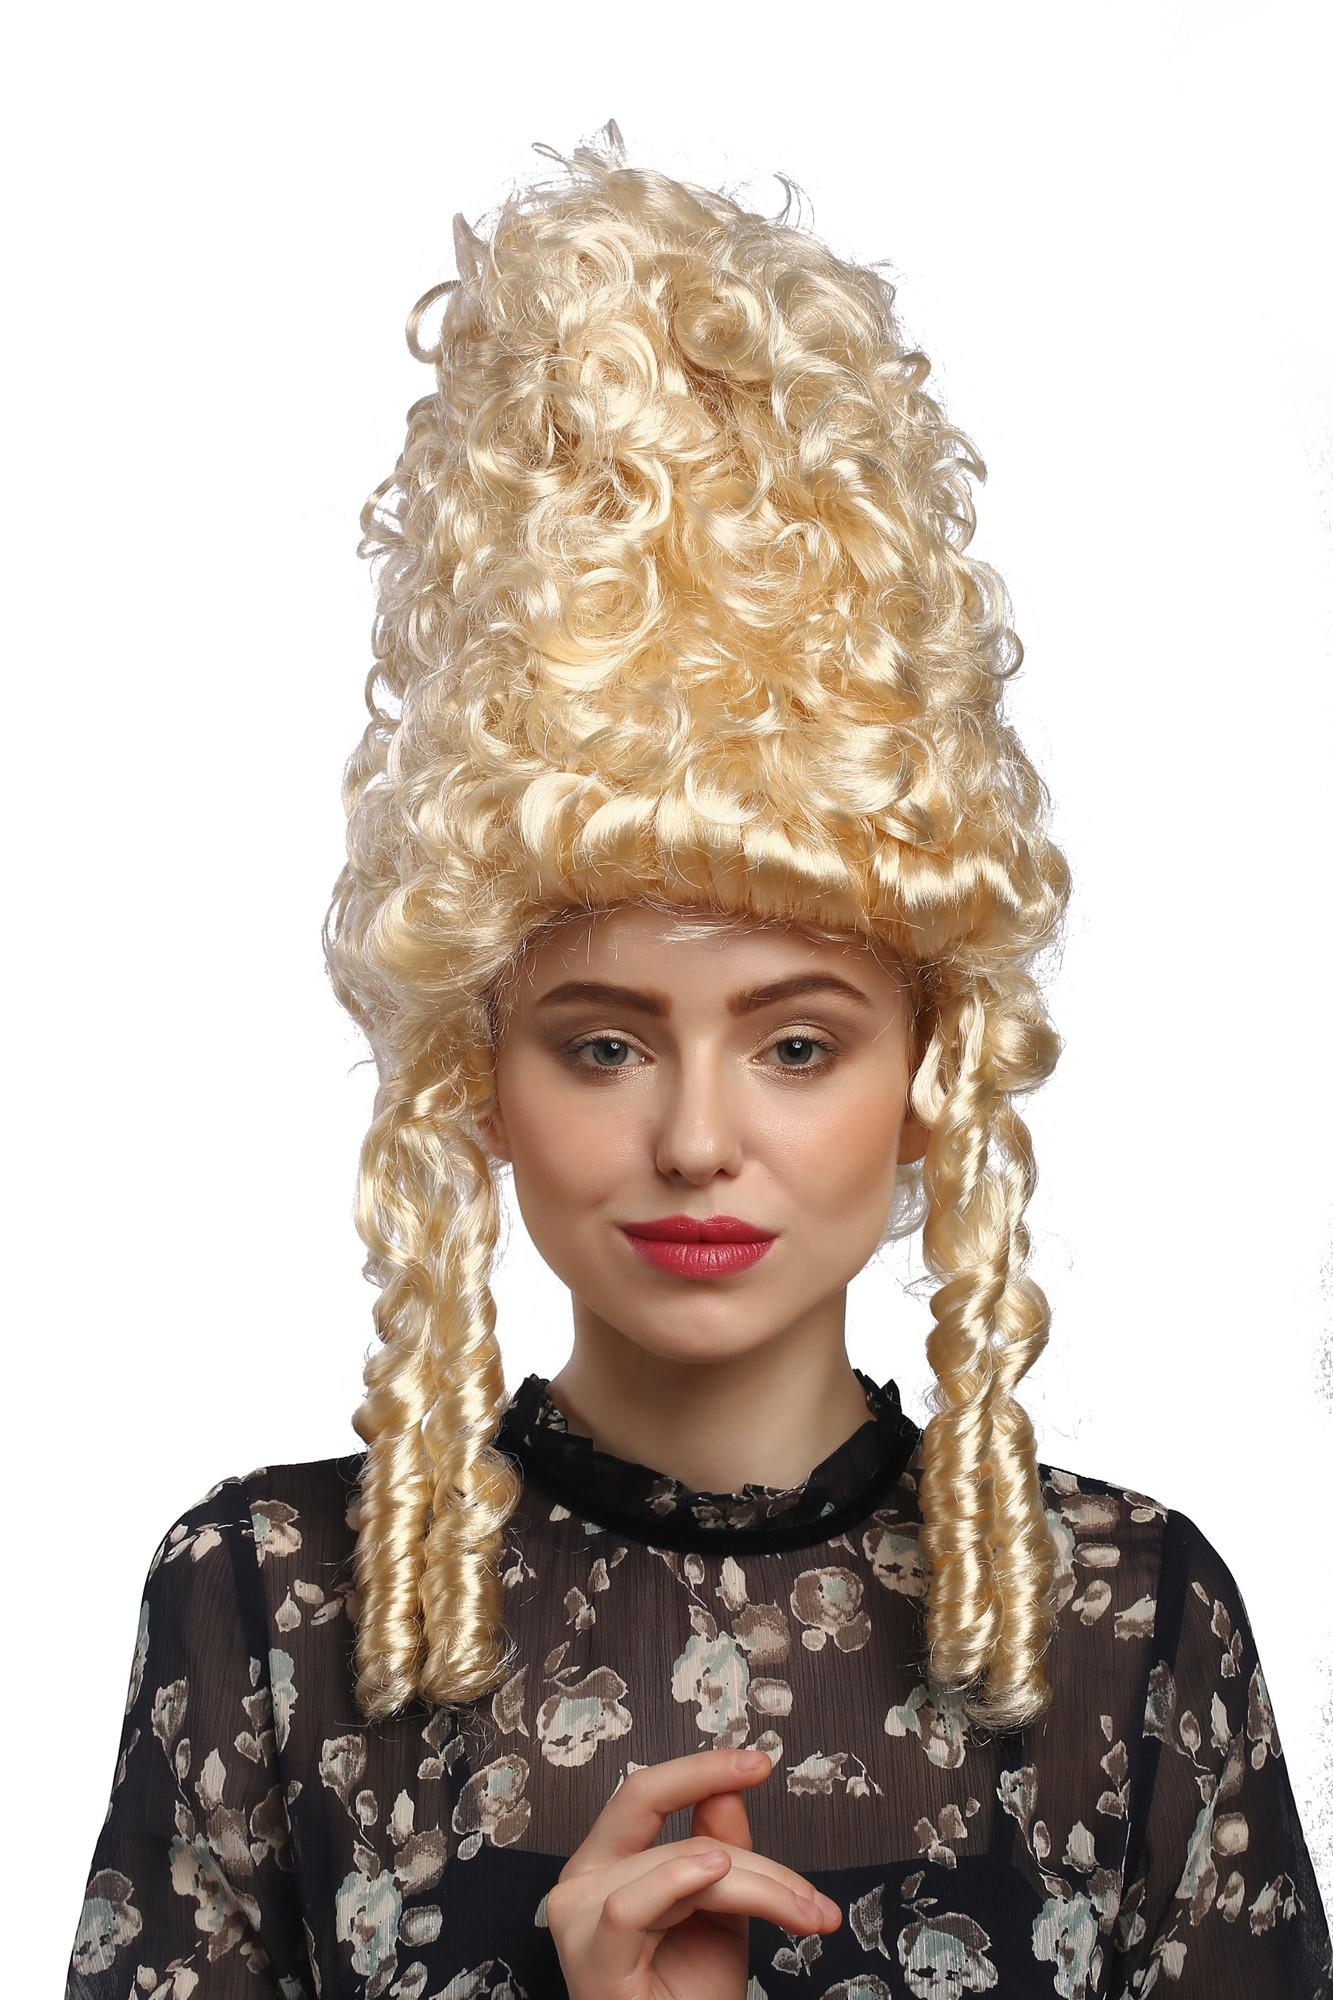 Perucke Damen Karneval Historisch Barock Blond Marie Antoinette Turmfrisur